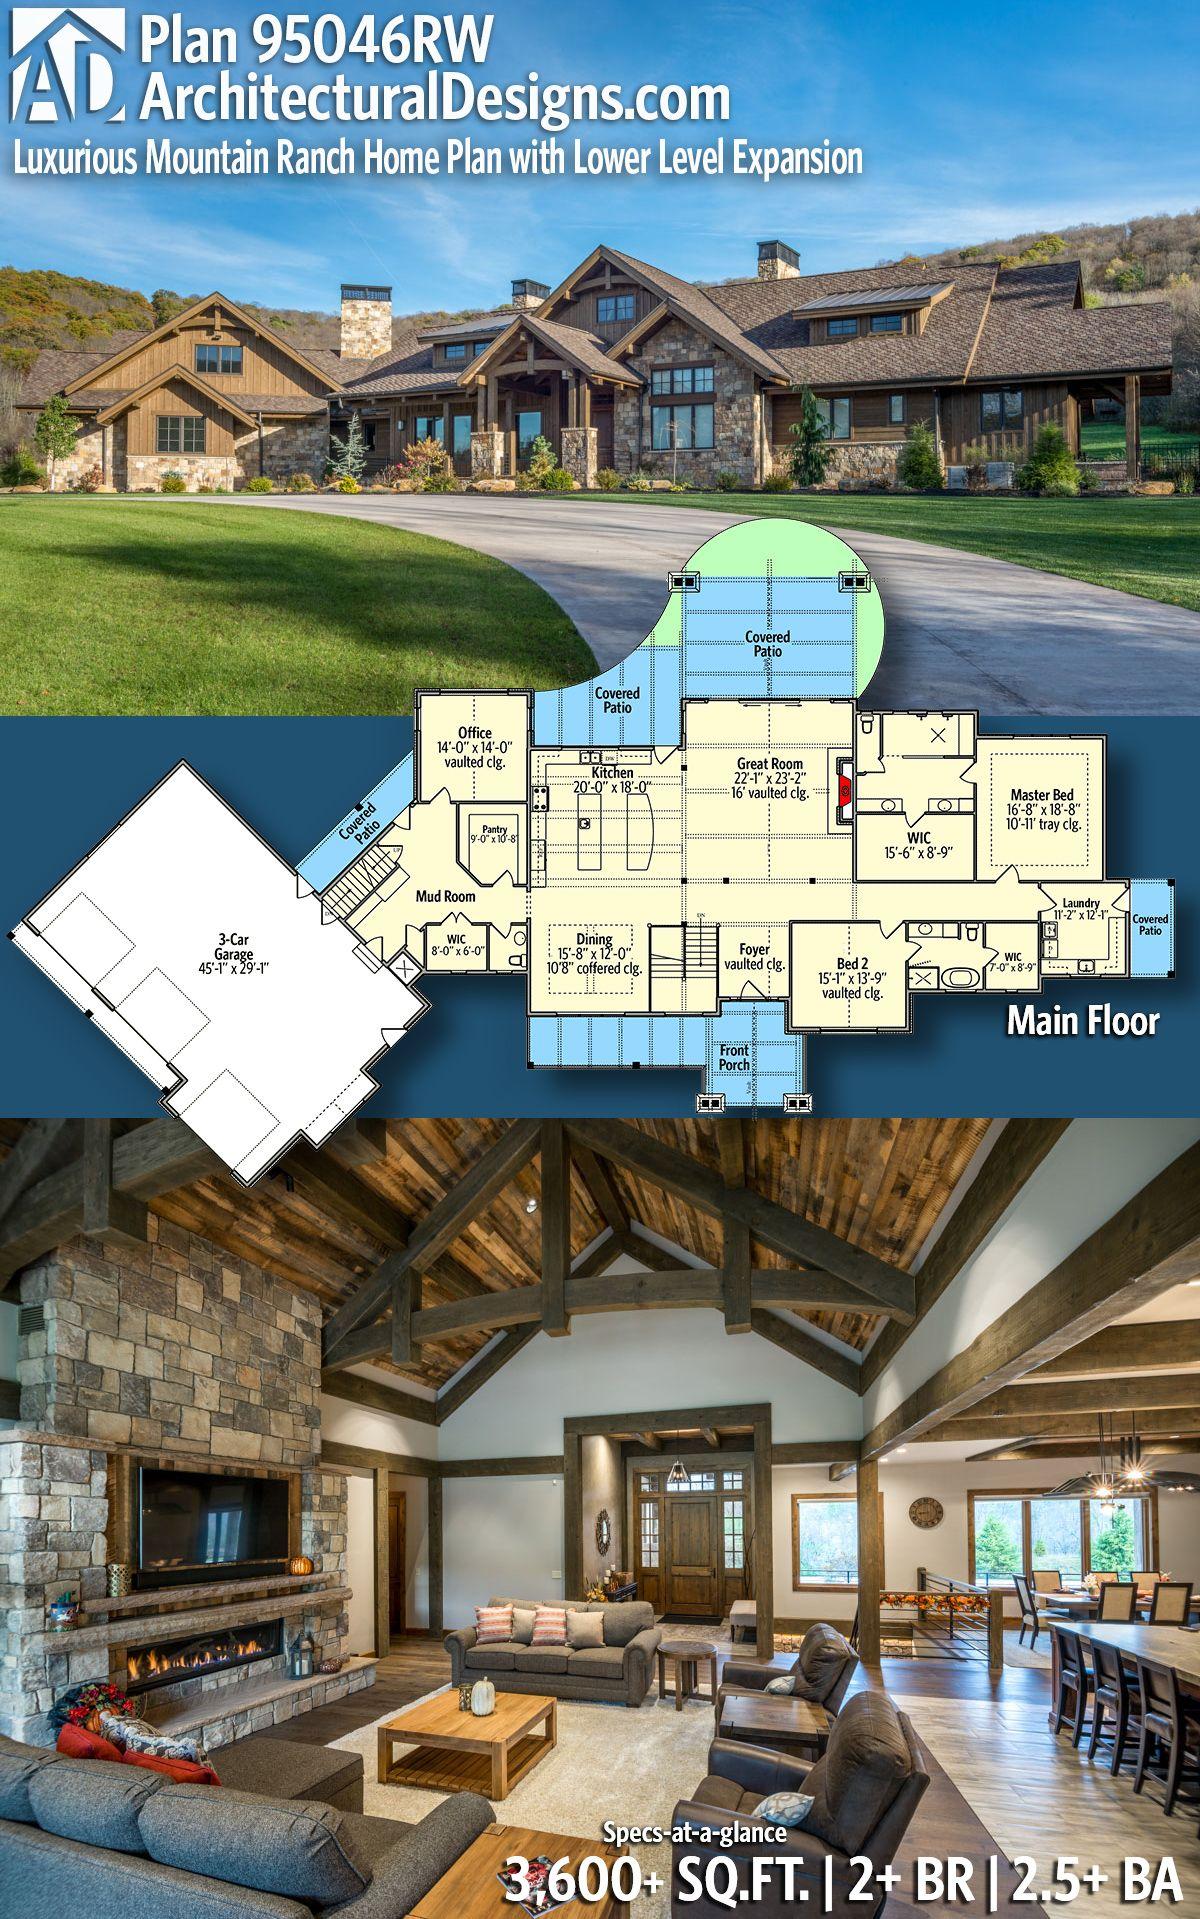 Architectural Designs House Plan 95046RW   2+ Beds   2.5+ Baths   3,600+